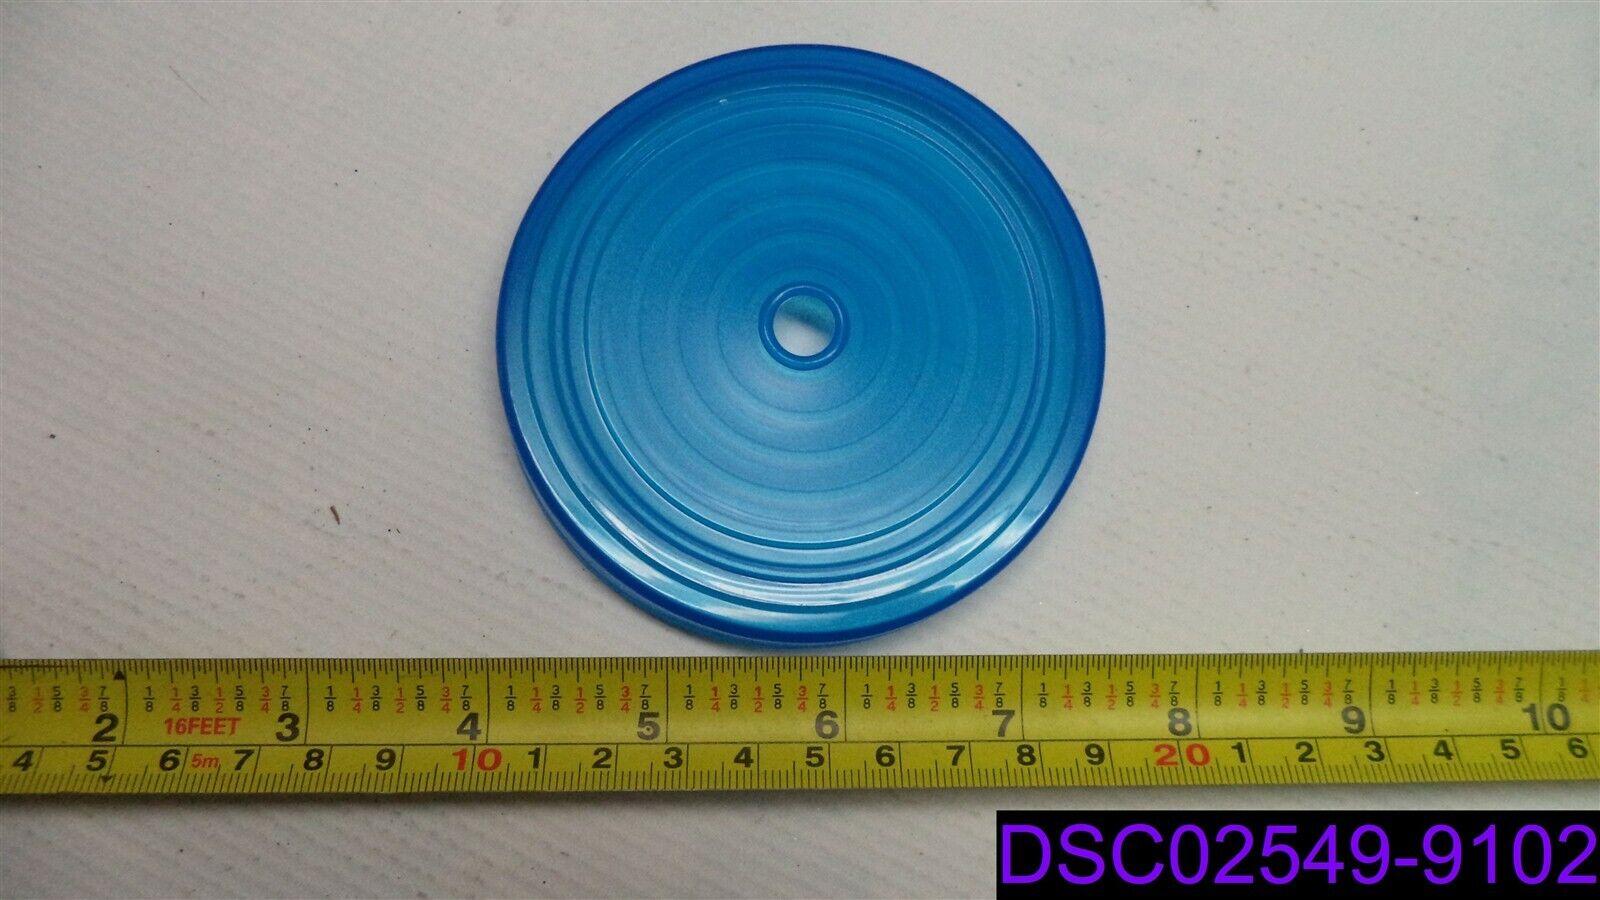 Qty = 50  Tapas de Taza de plástico azul 3-5 8  ID